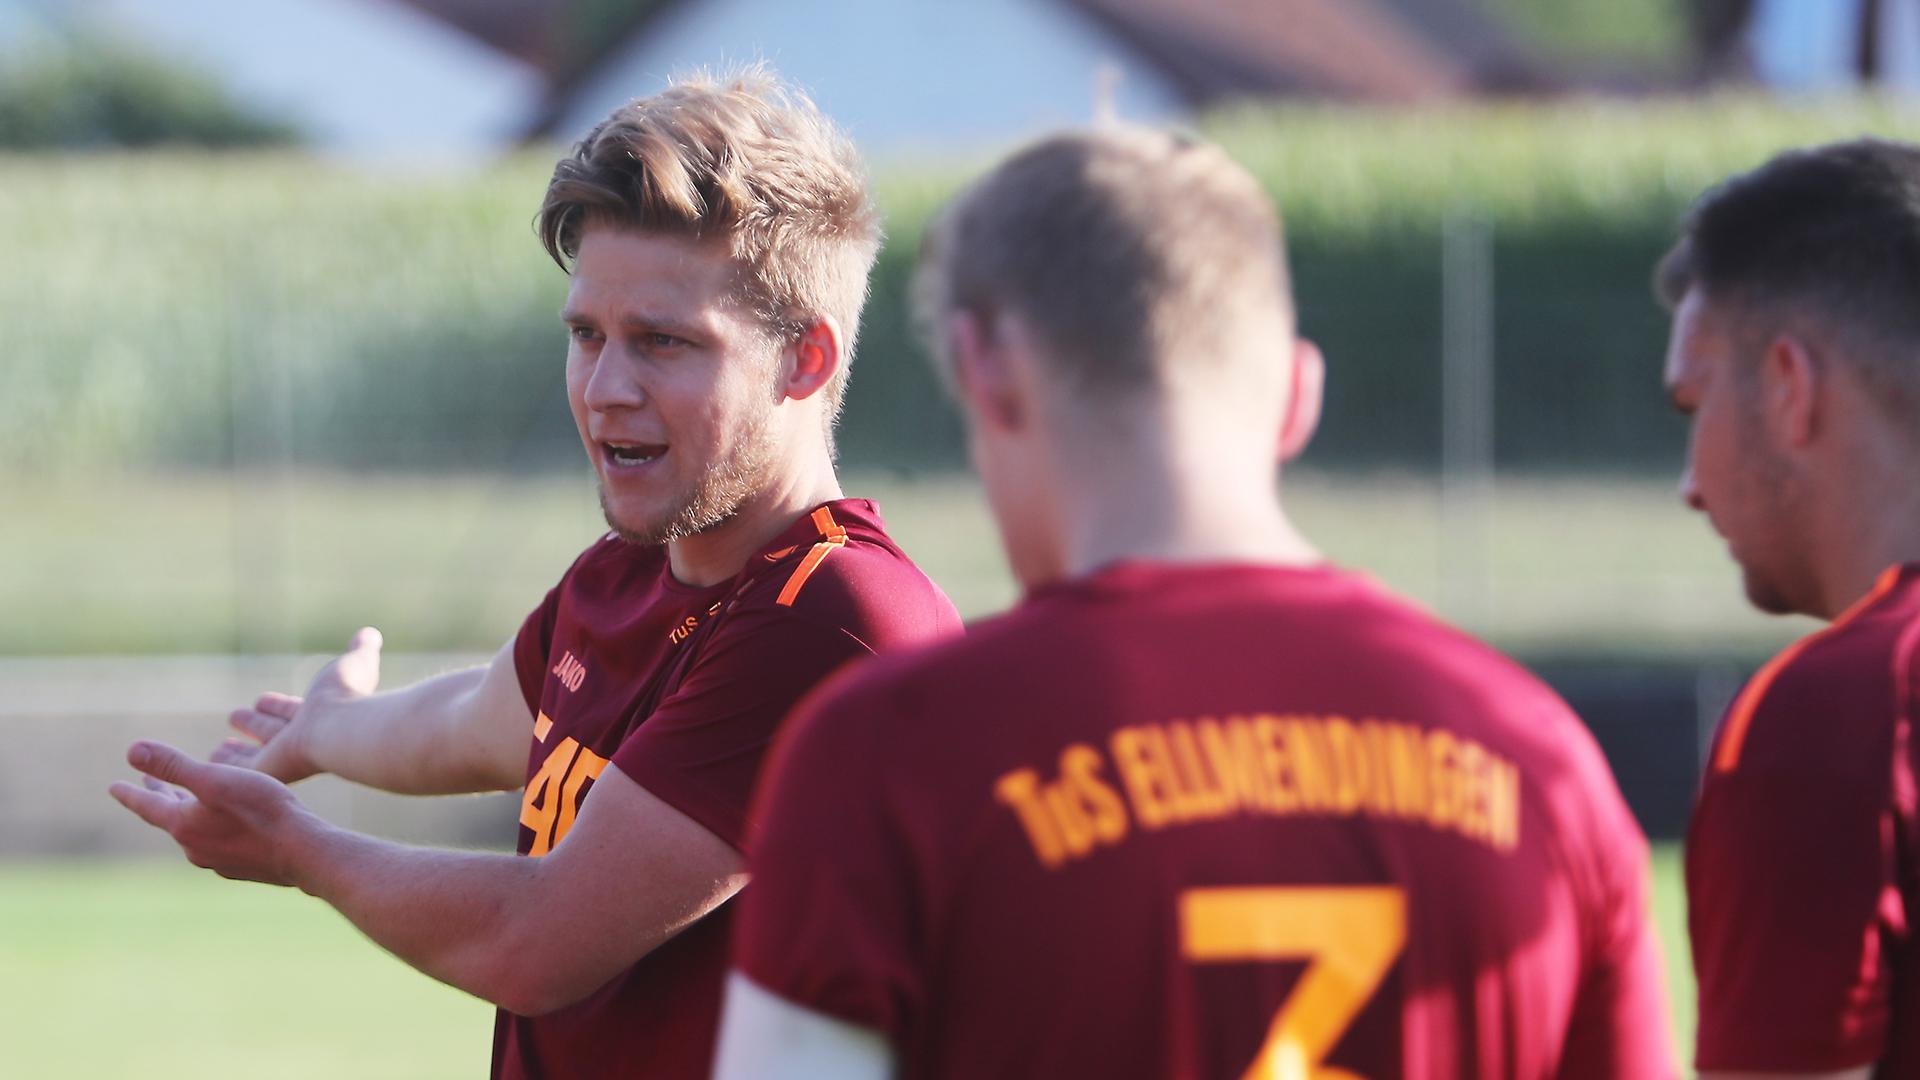 Diebold Marius links_Spielertrainer Ellmendingen